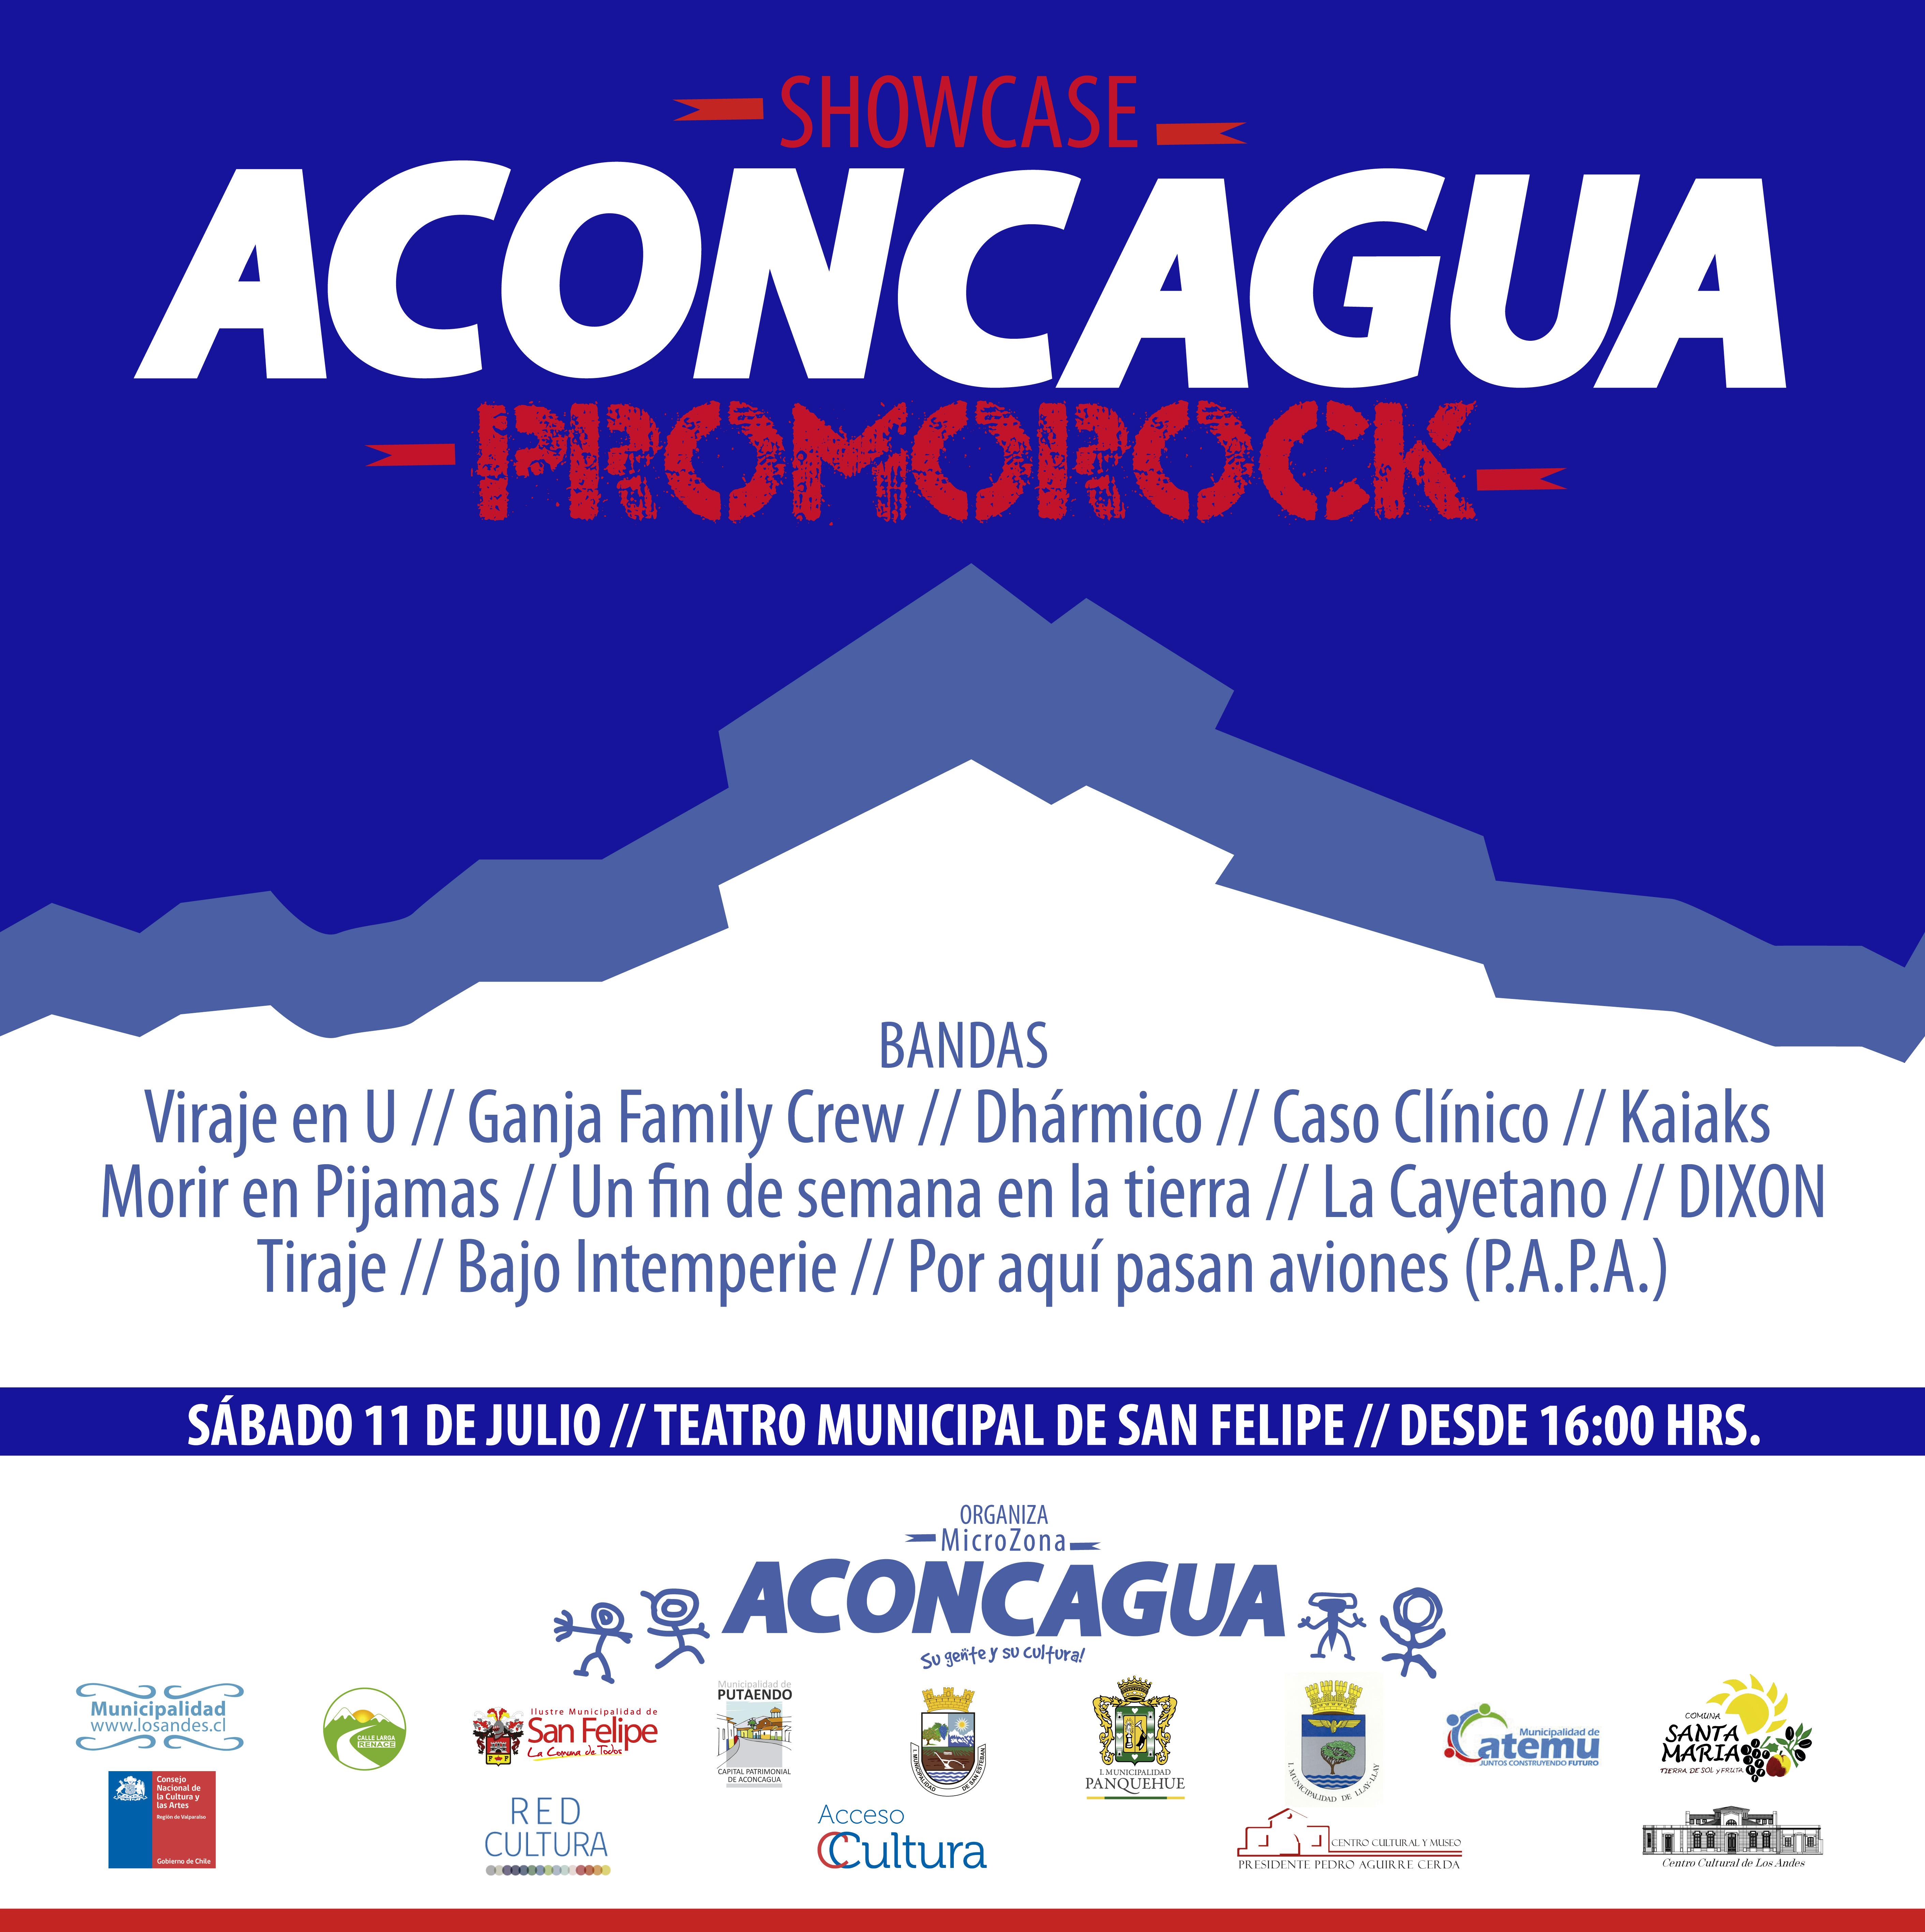 AconcaguaPromoRock2015